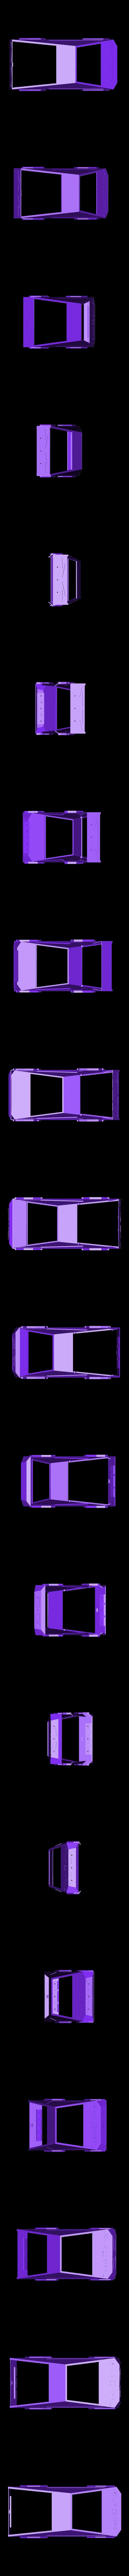 p1.STL Download free STL file RC car Cybertruck • 3D printing object, TB3D